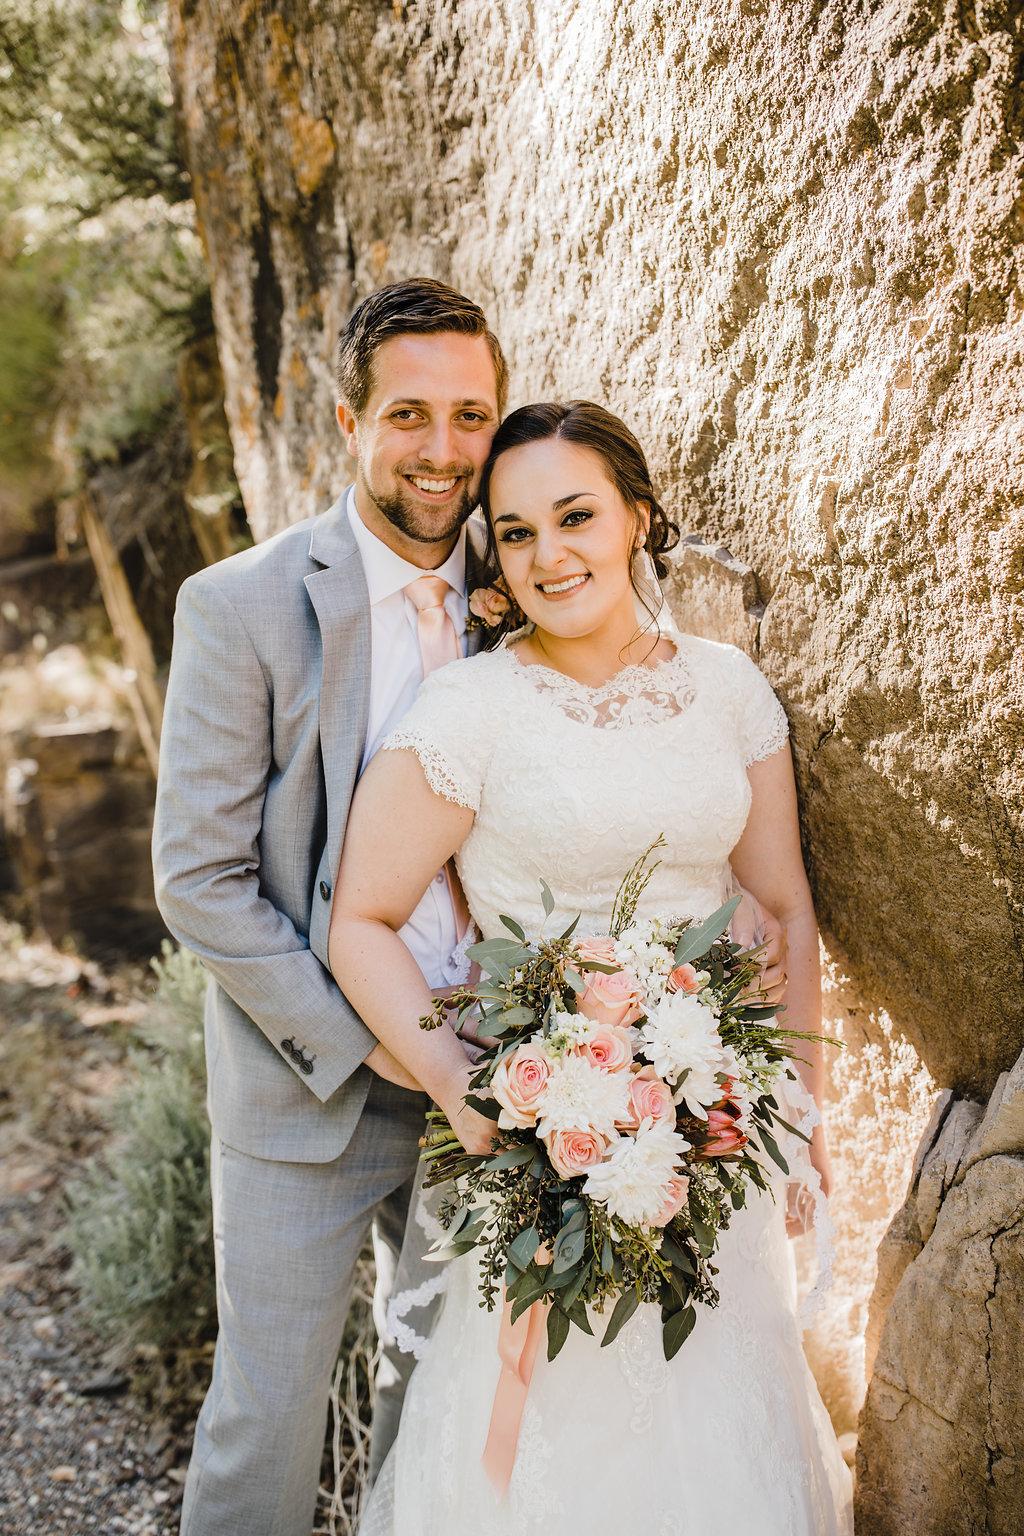 bride and groom on wedding day monroe utah blush and grey